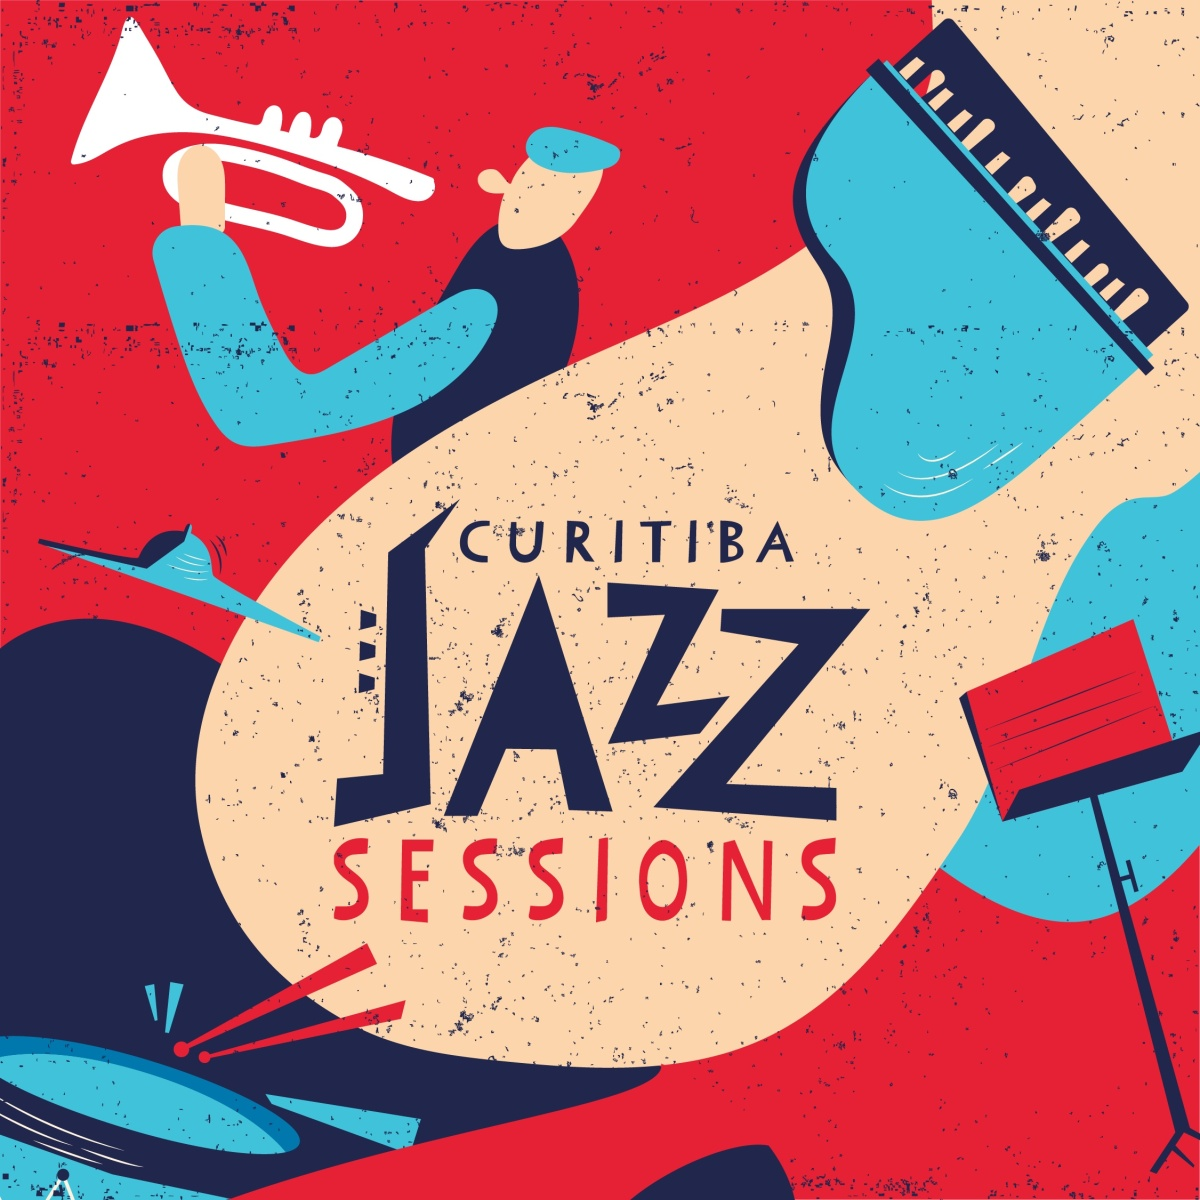 1º Curitiba Jazz Sessions